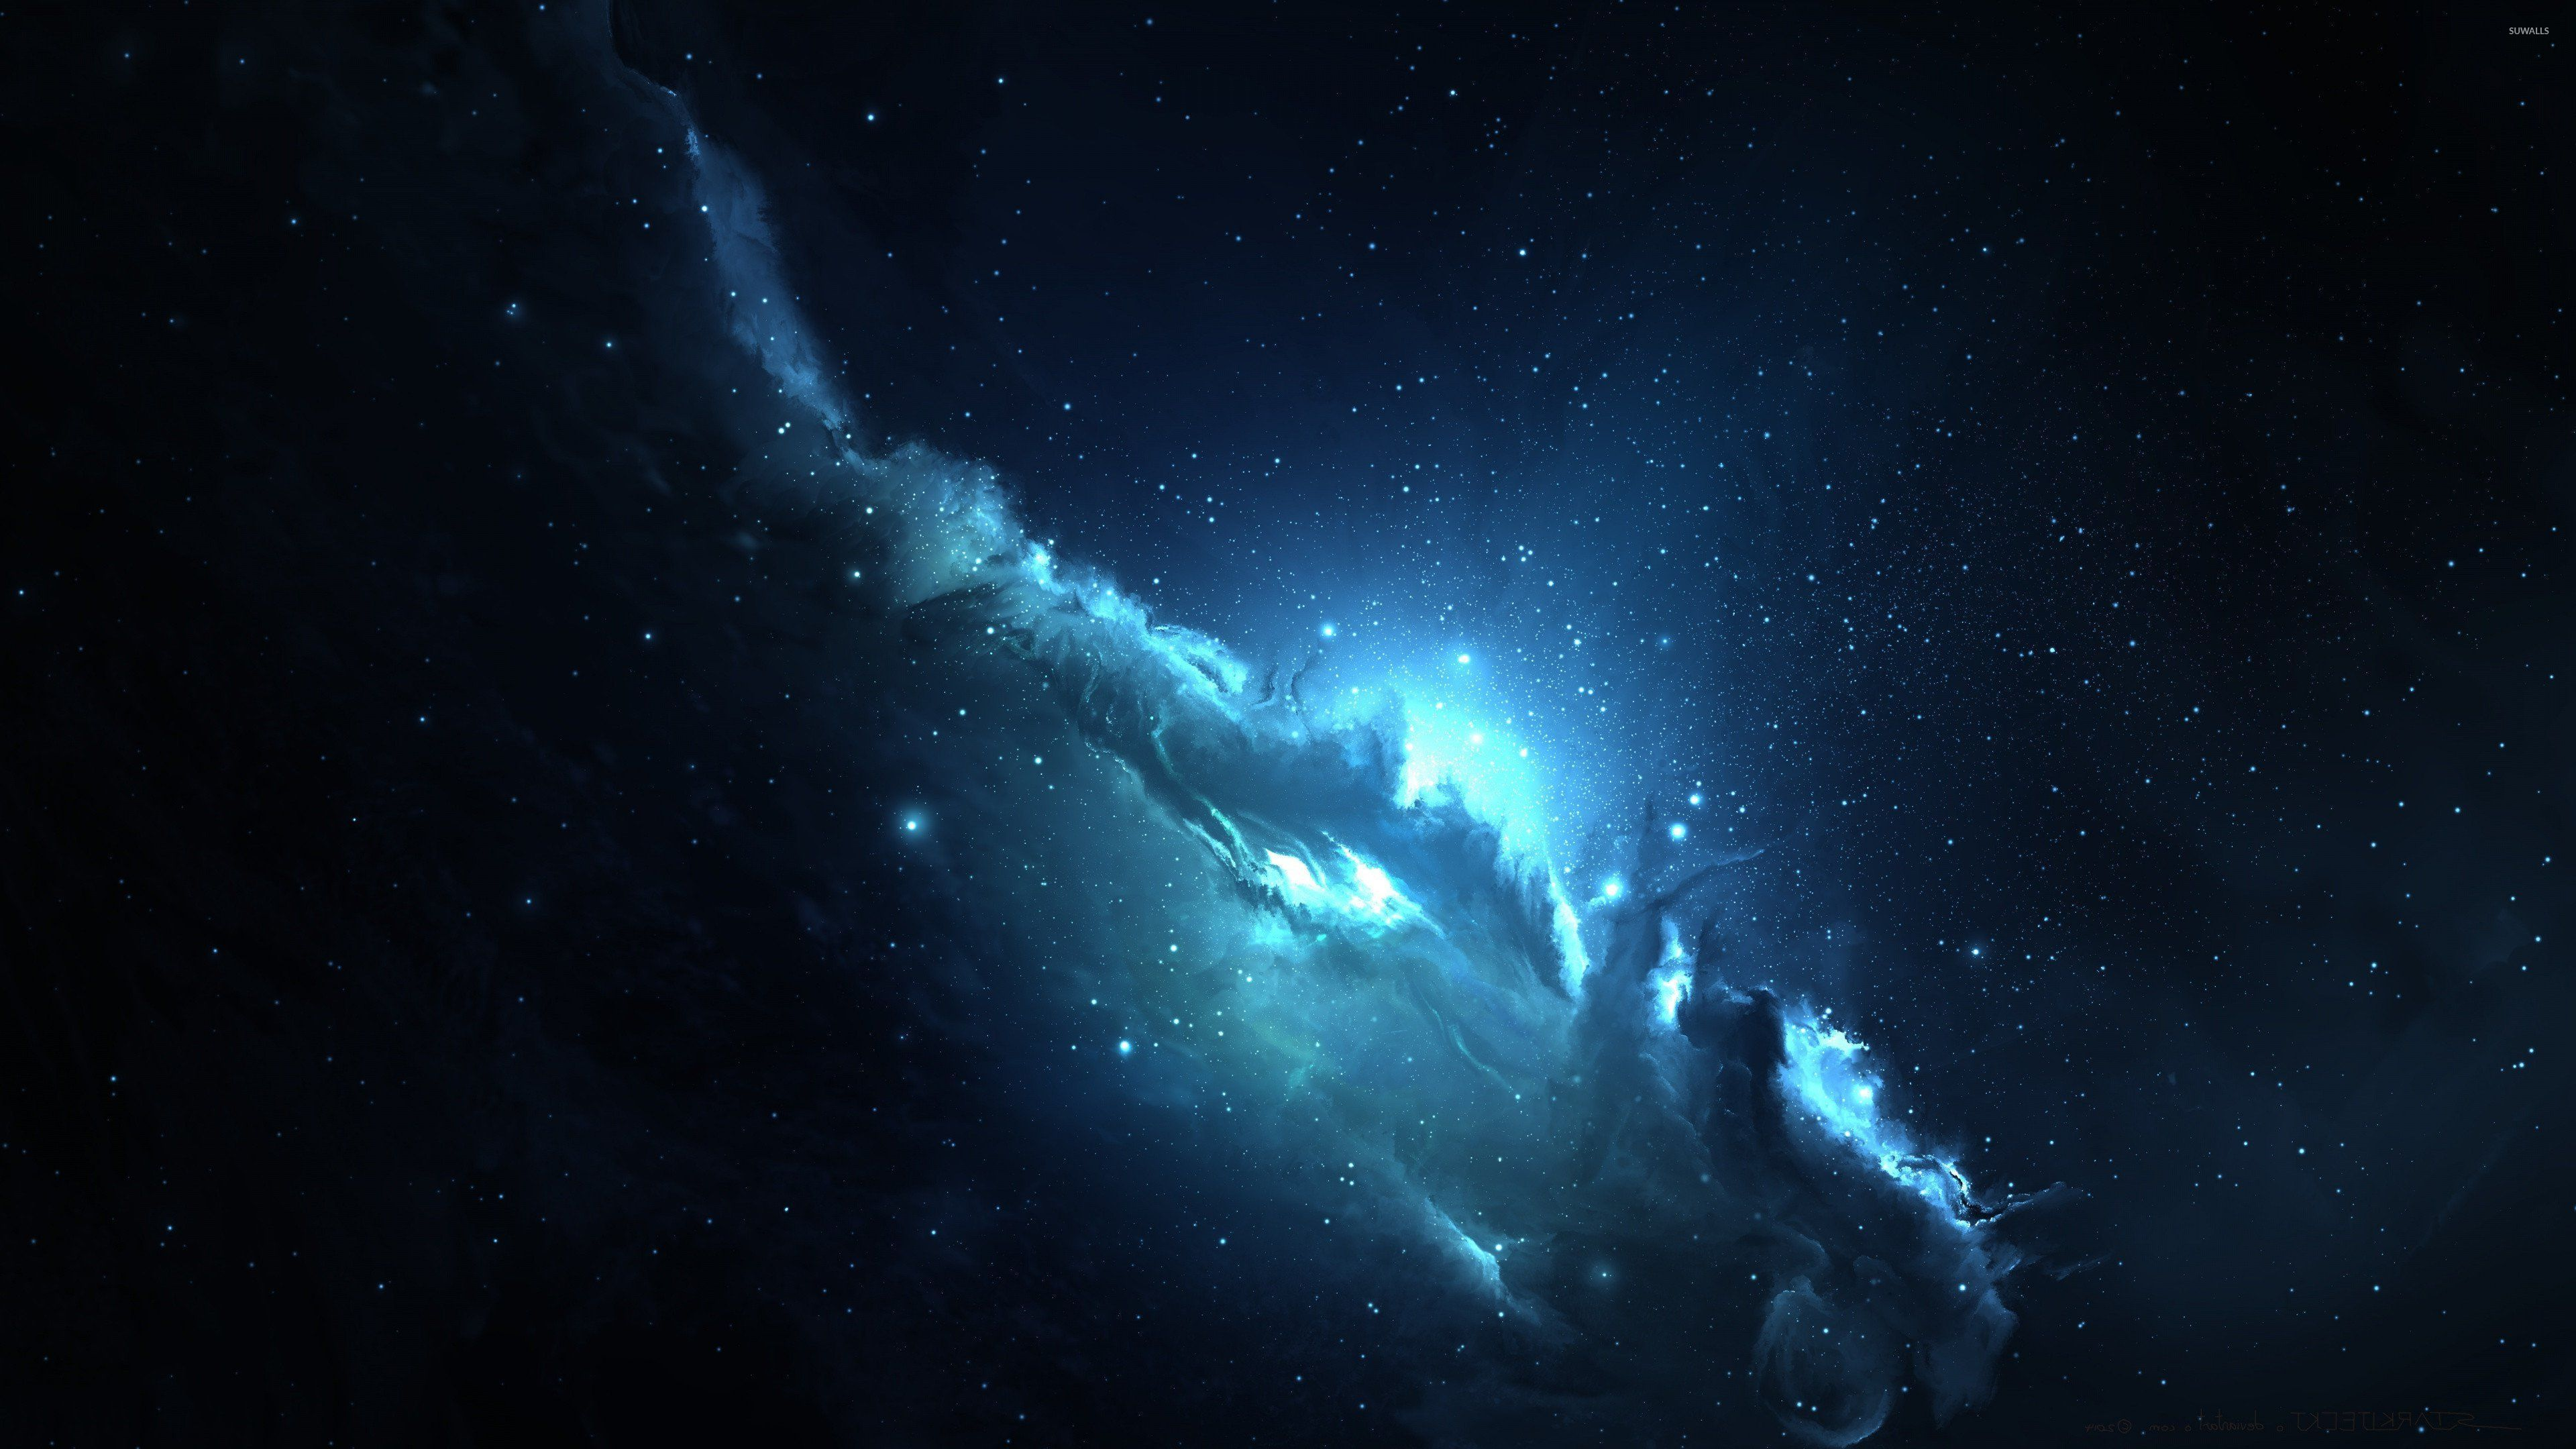 Blue Nebula Wallpapers - Top Free Blue ...